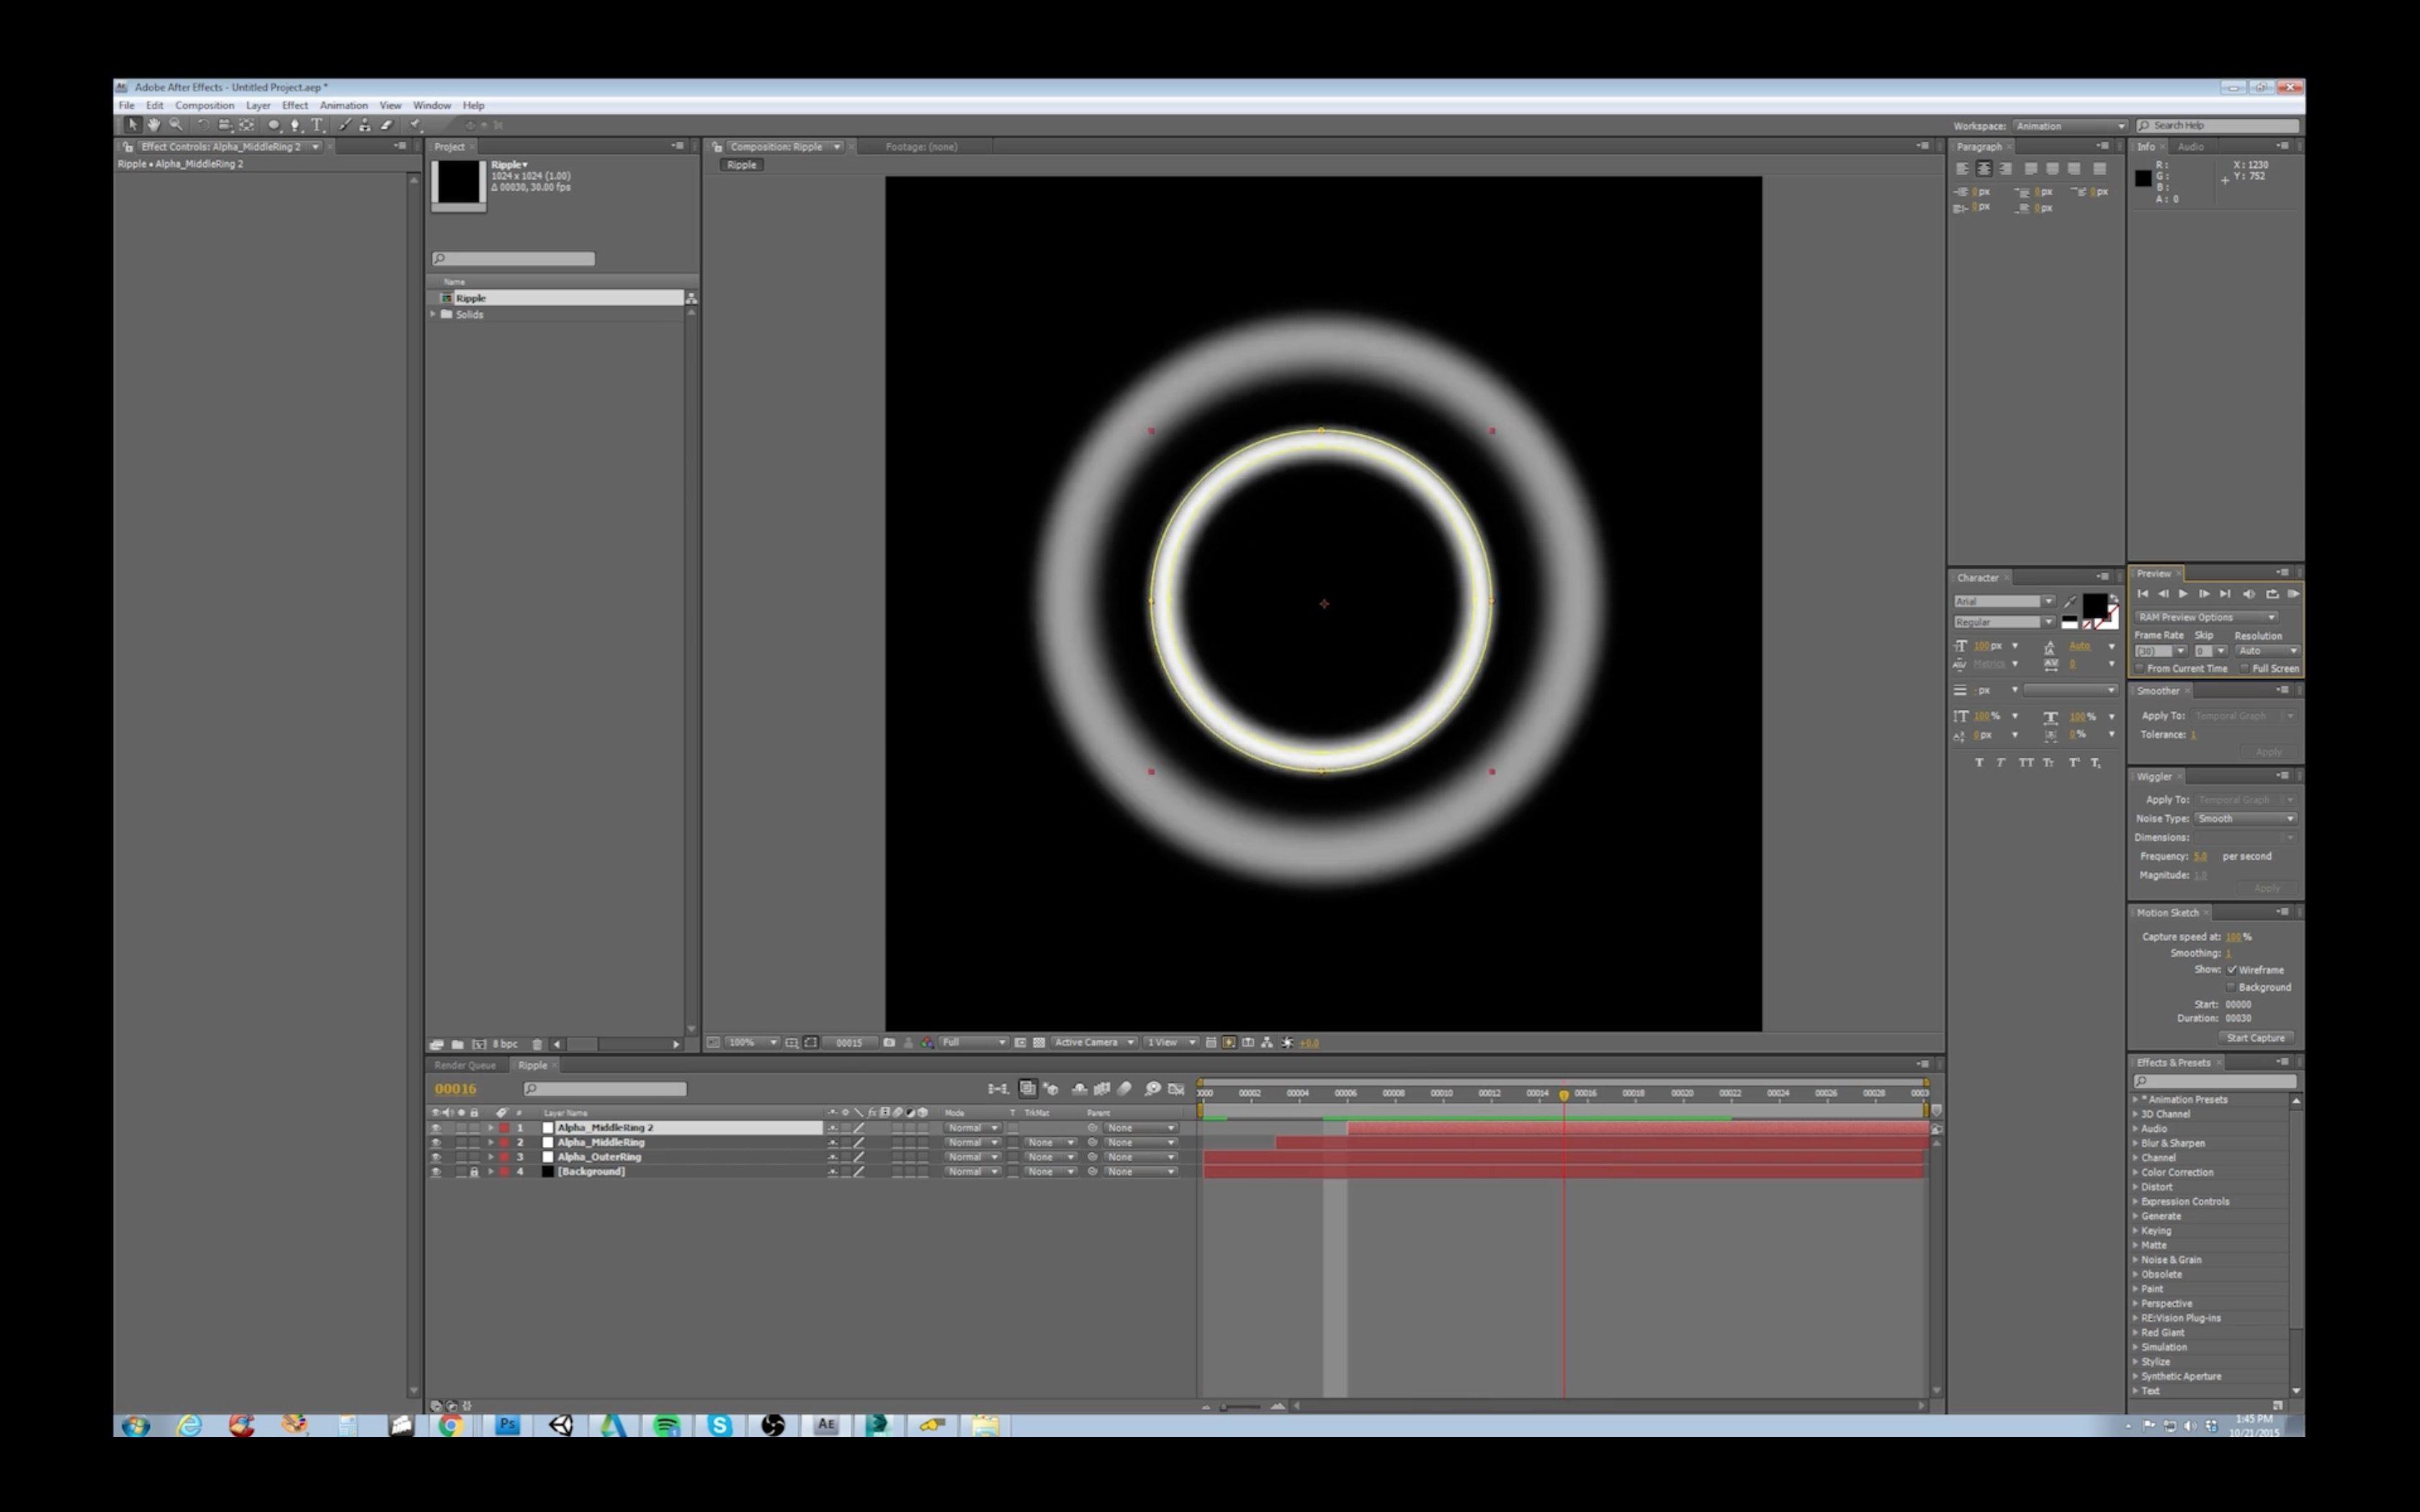 Animated Ripple Effect in 3D Studio Max